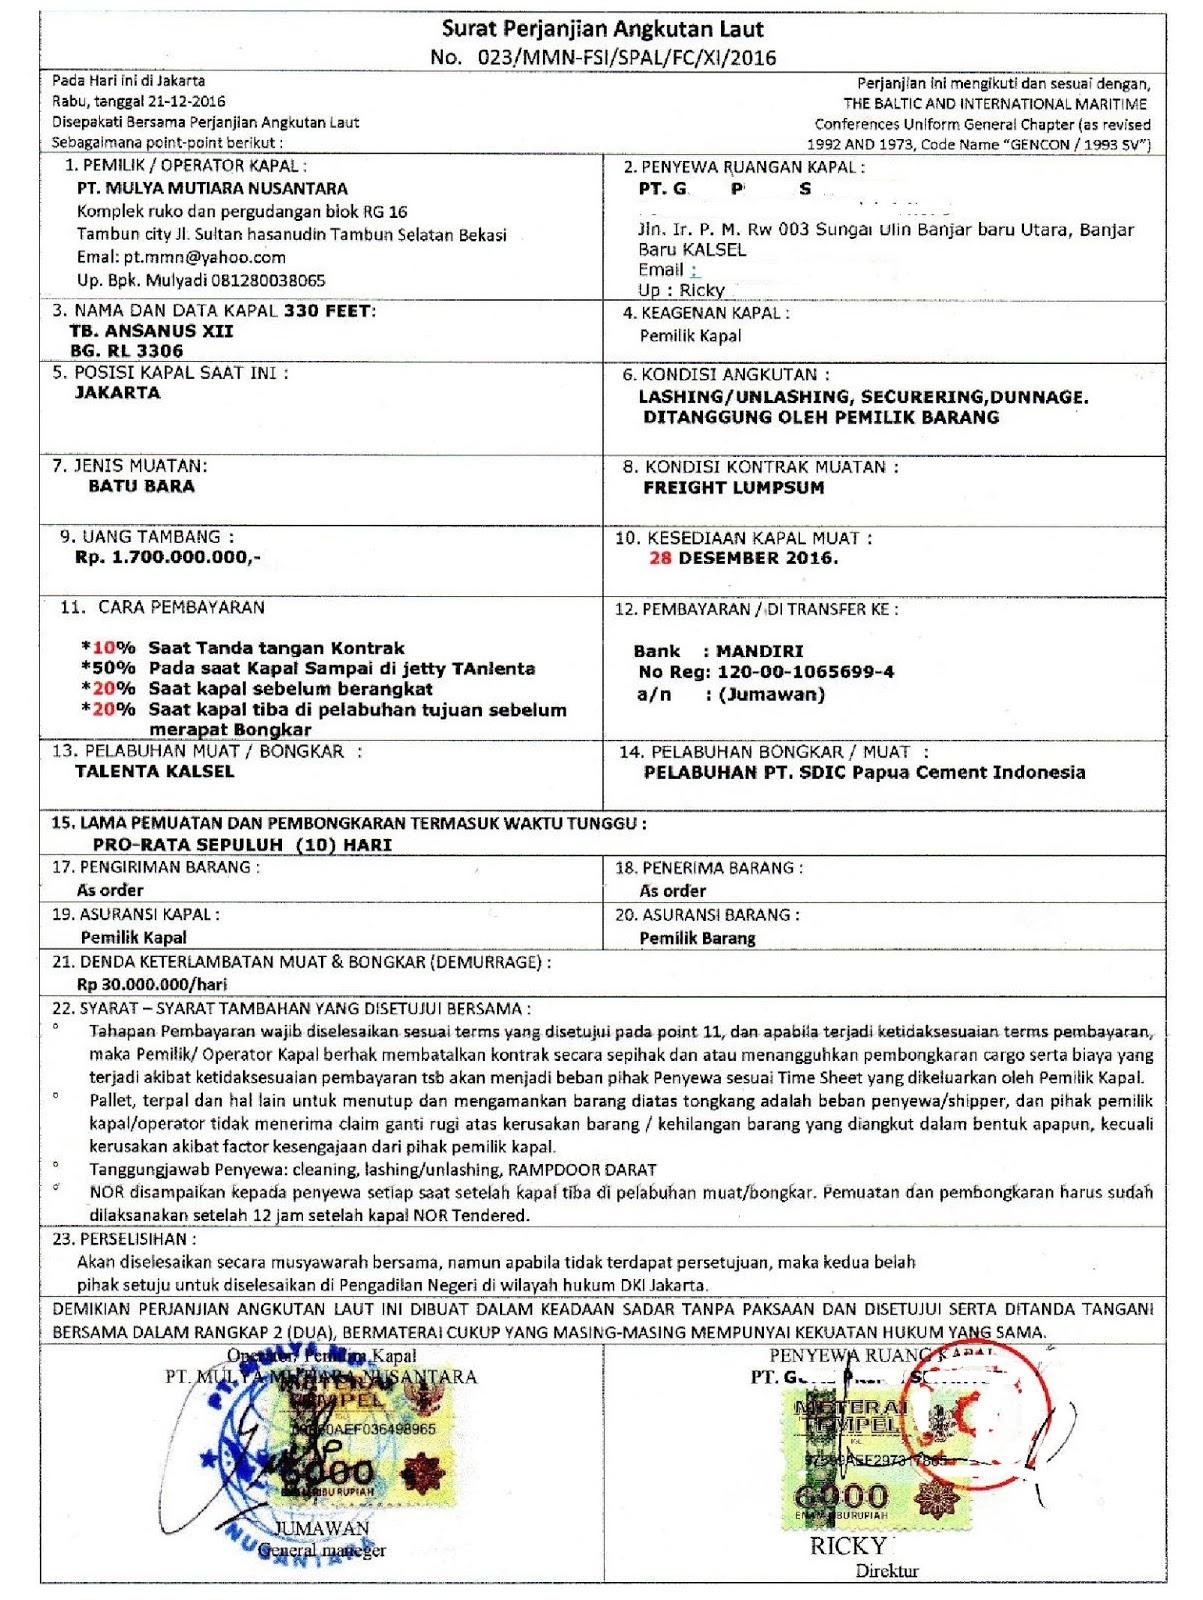 Pt Mulya Mutiara Nusantara Yang Memberikan Komitmen Fee